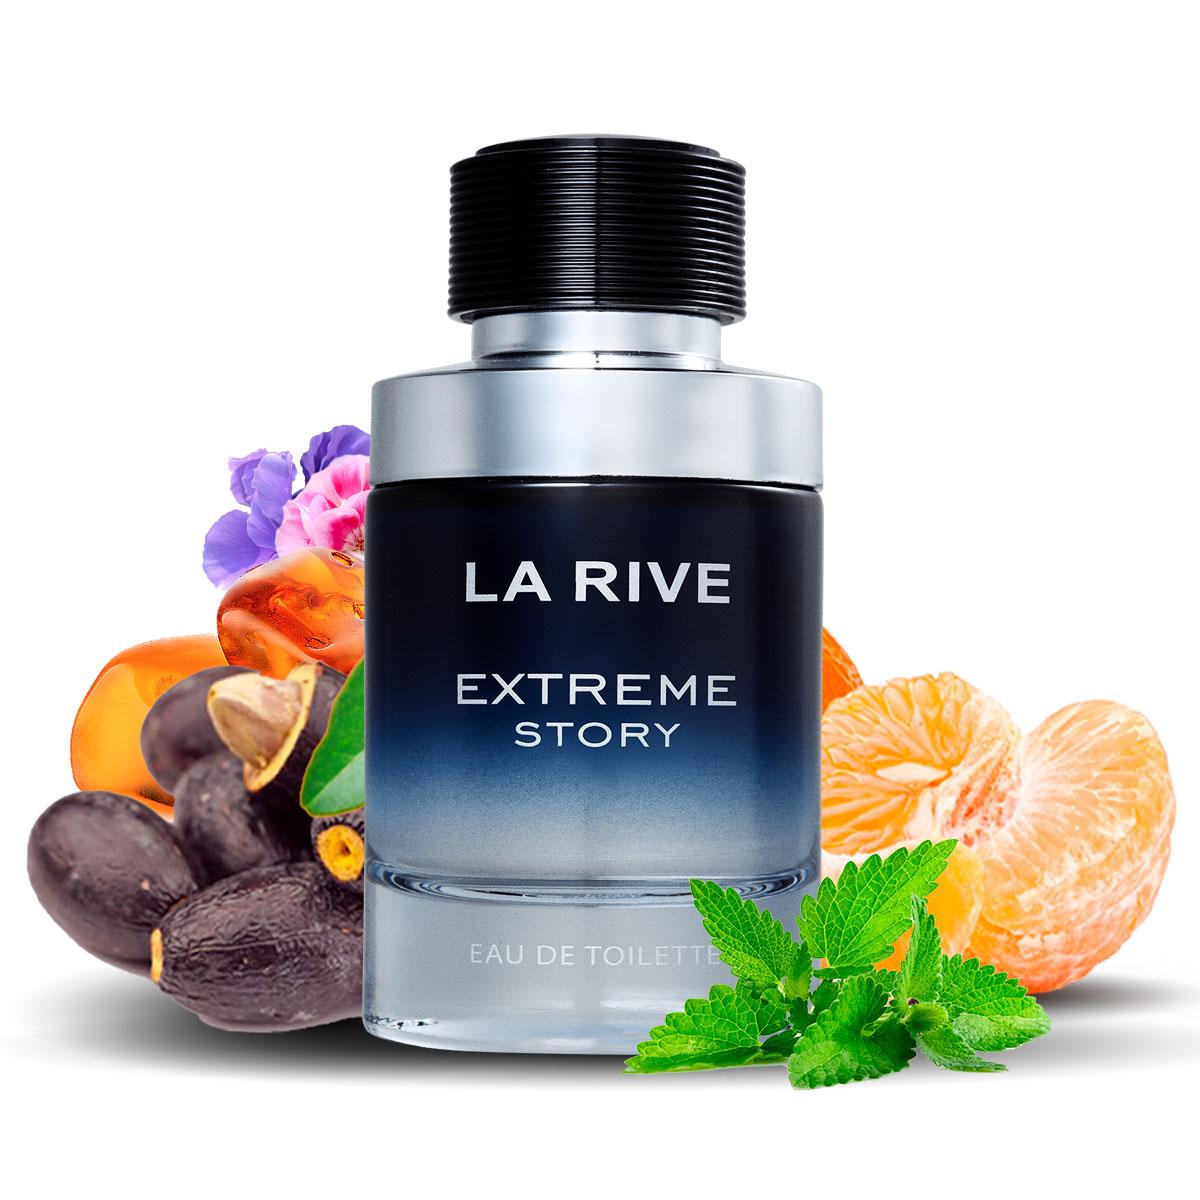 Kit 2 Perfumes Importados Extreme e Body Like a Man La Rive  - Mercari Perfumes